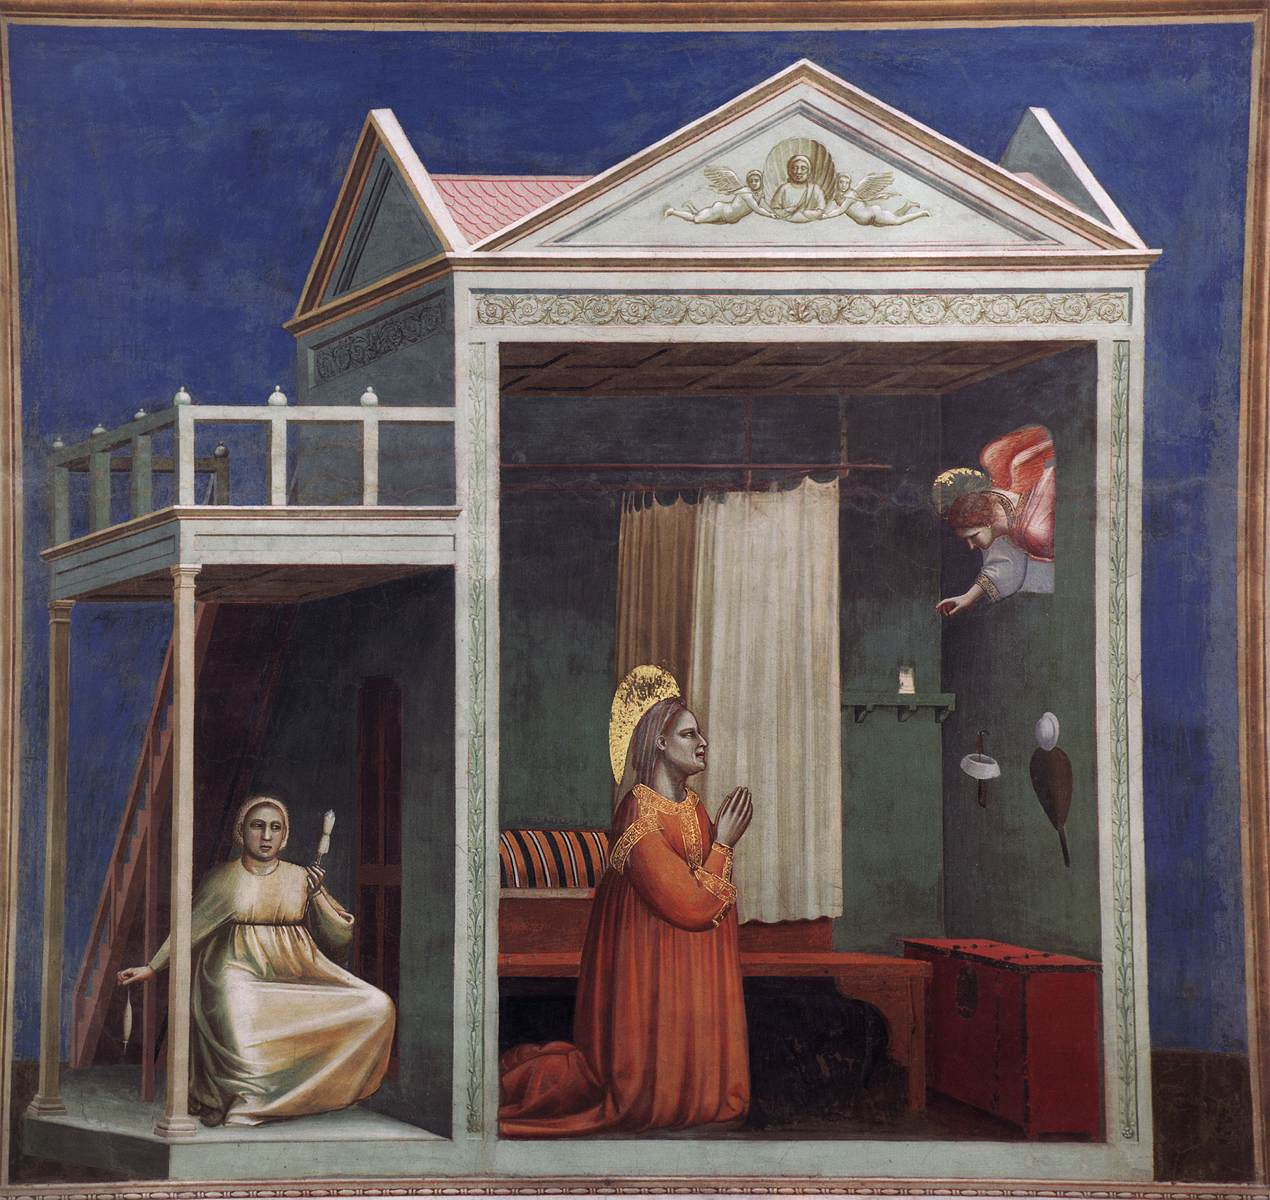 Giotto di Bondone, Annunciatie aan de heilige Anna, Fresco, 200 x 185 cm, Cappella Scrovegni (Arenakapel), Padua